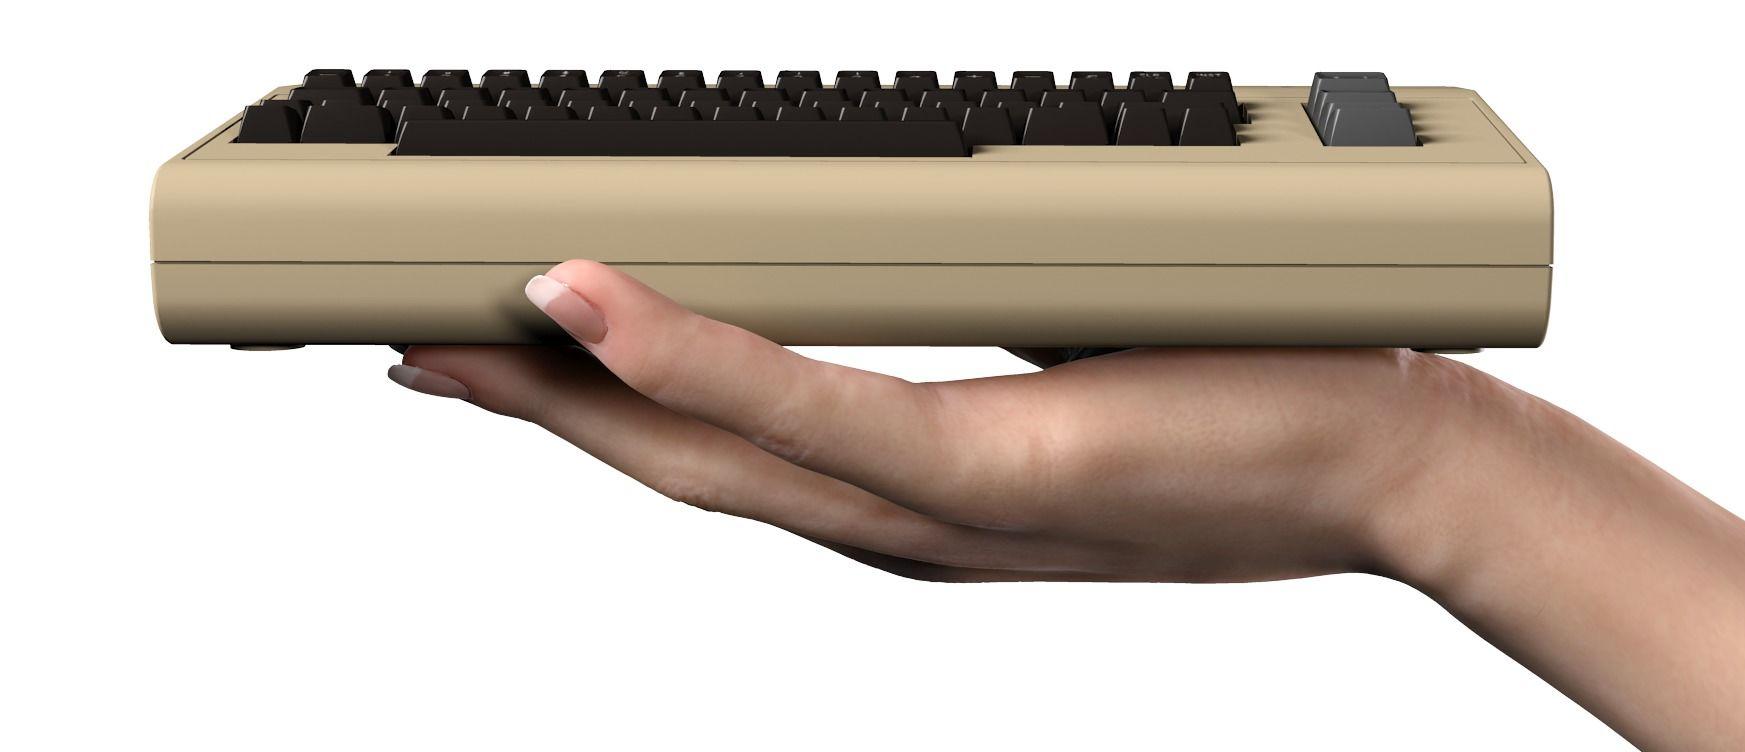 C64 Mini lanseres i 2018.